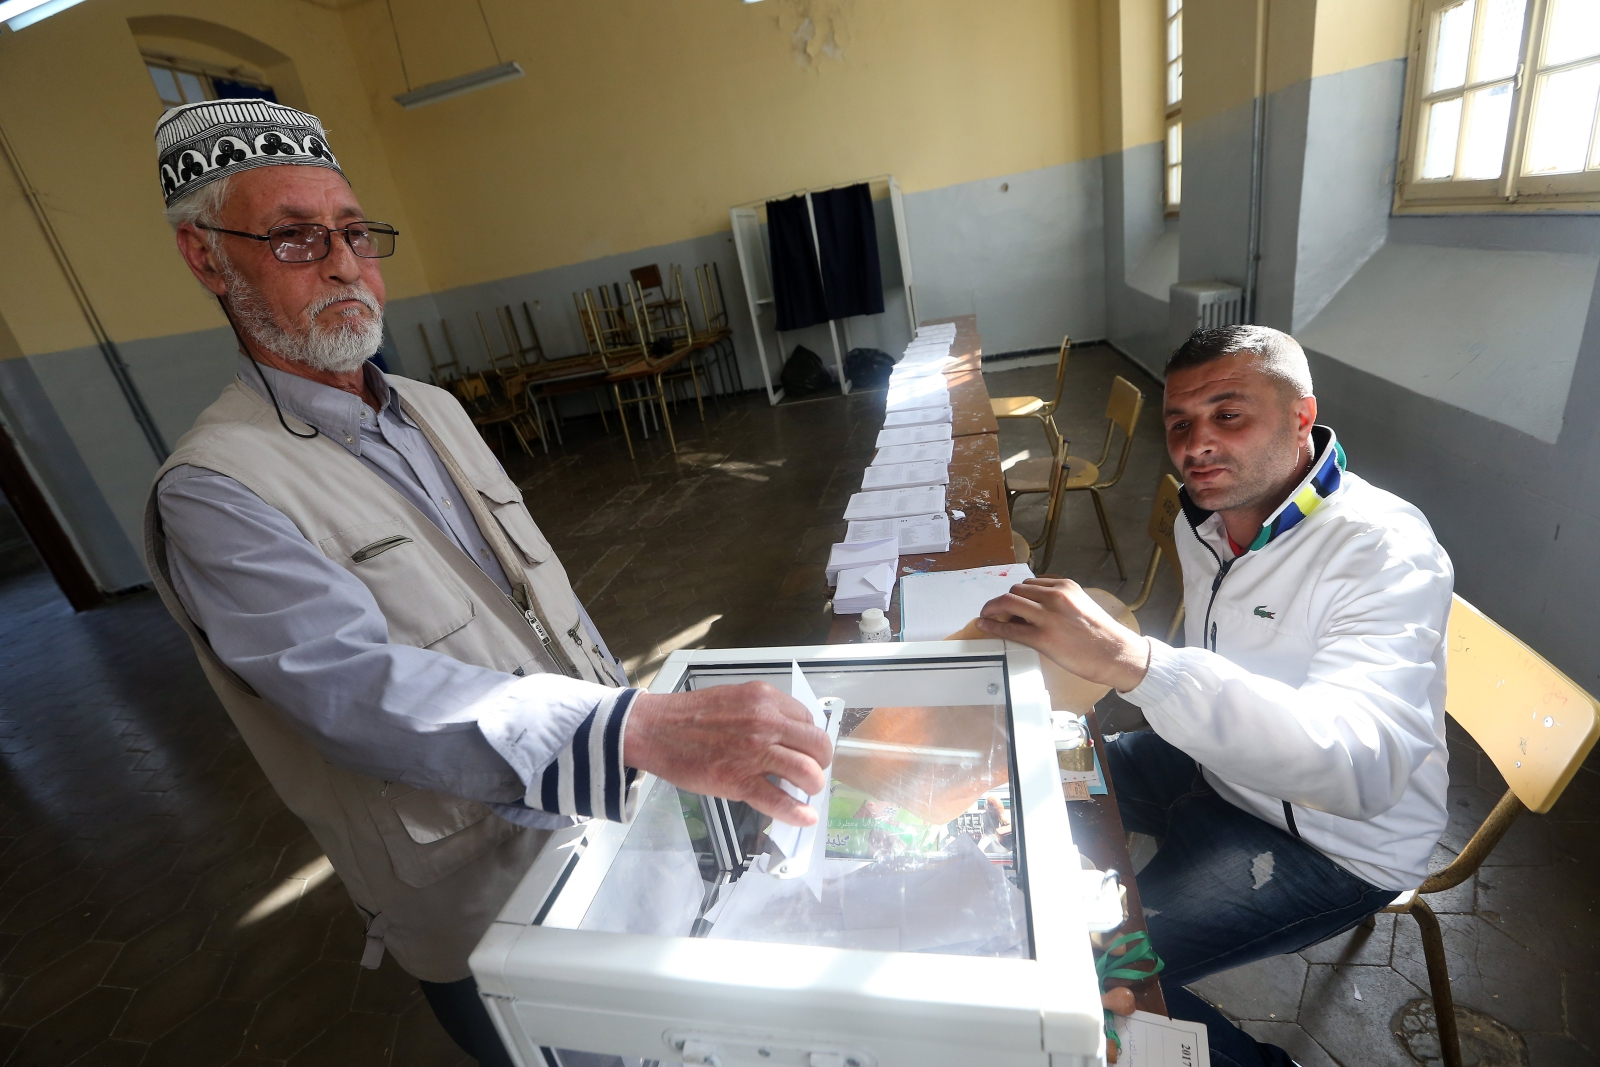 Wybory parlamentarne w Algierii. Fot. PAP/EPA/MOHAMED MESSARA